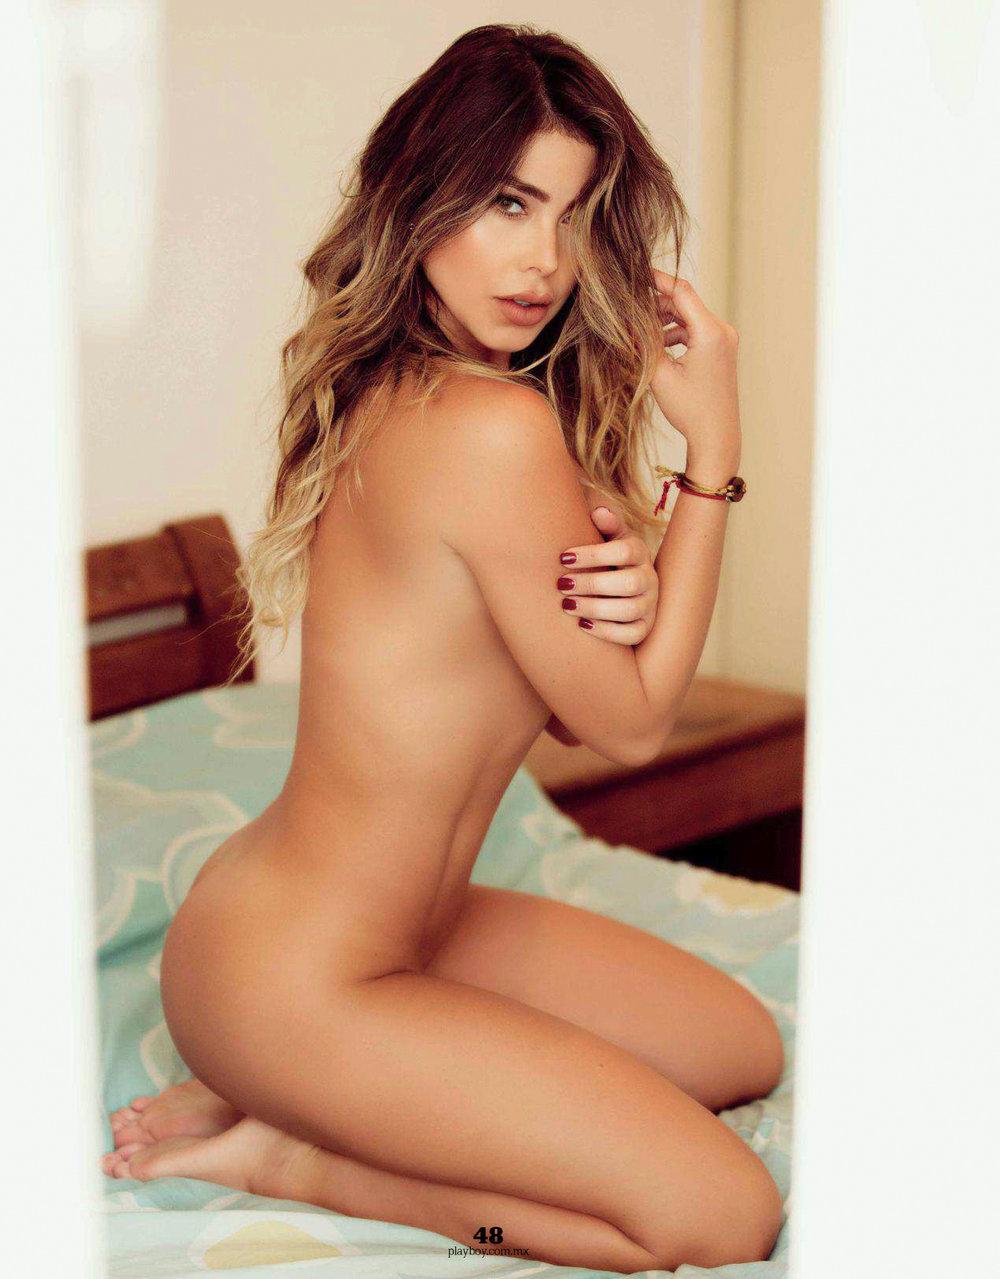 fabitogomez_201805-Playboy México-50.jpg